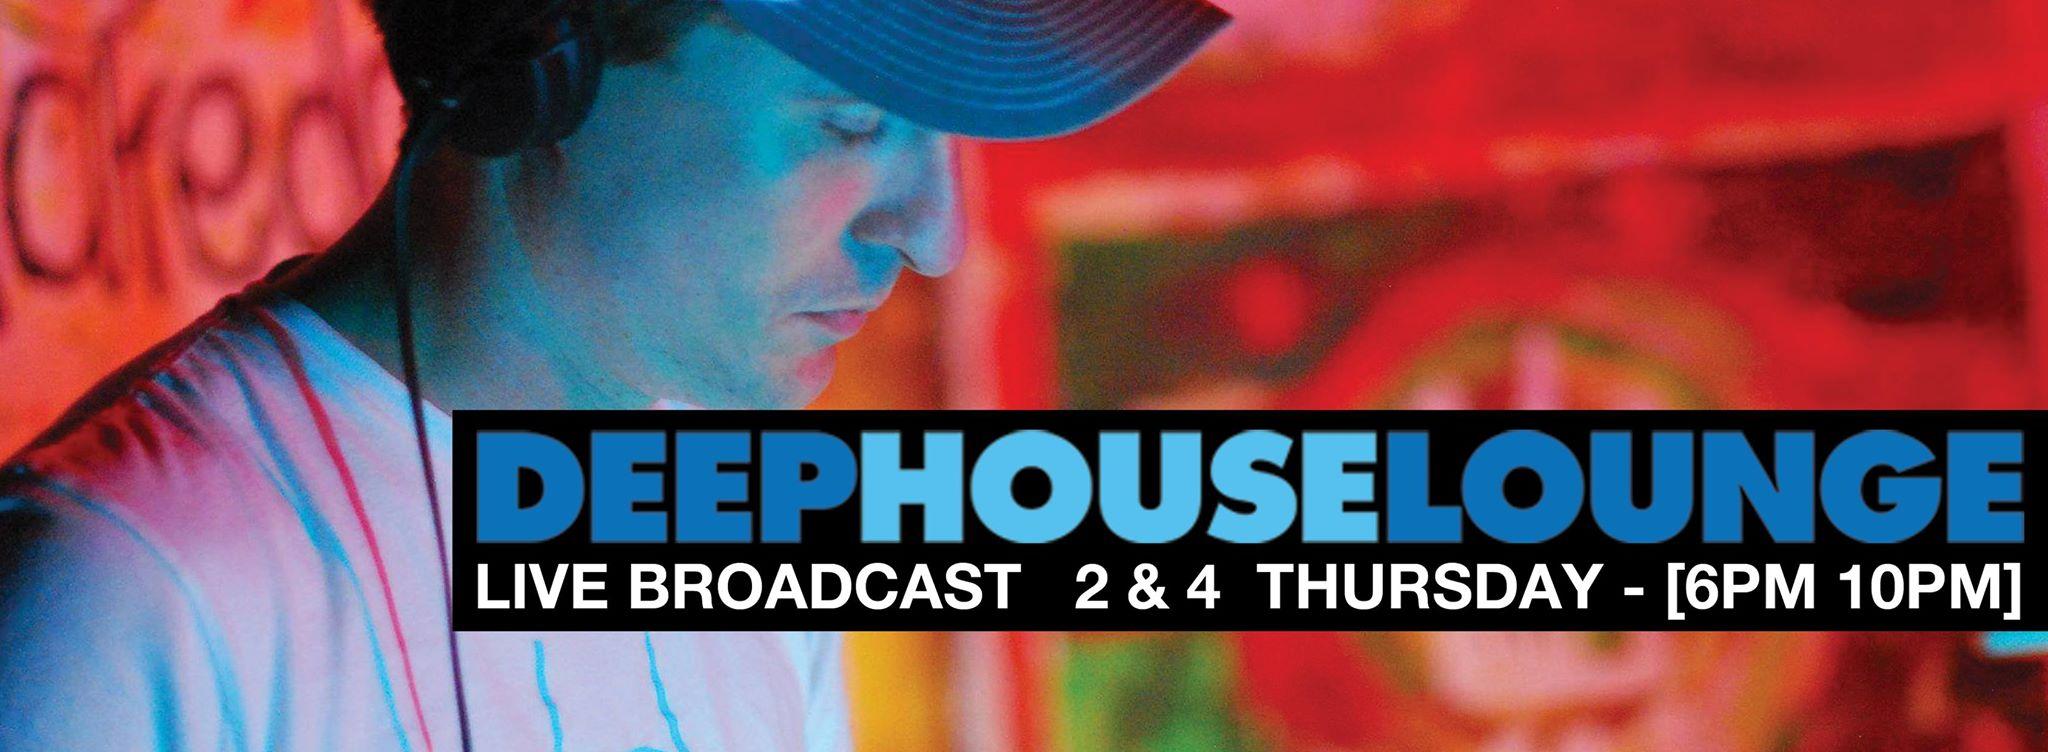 Soulglow radio deep house lounge house music radio and for House music radio